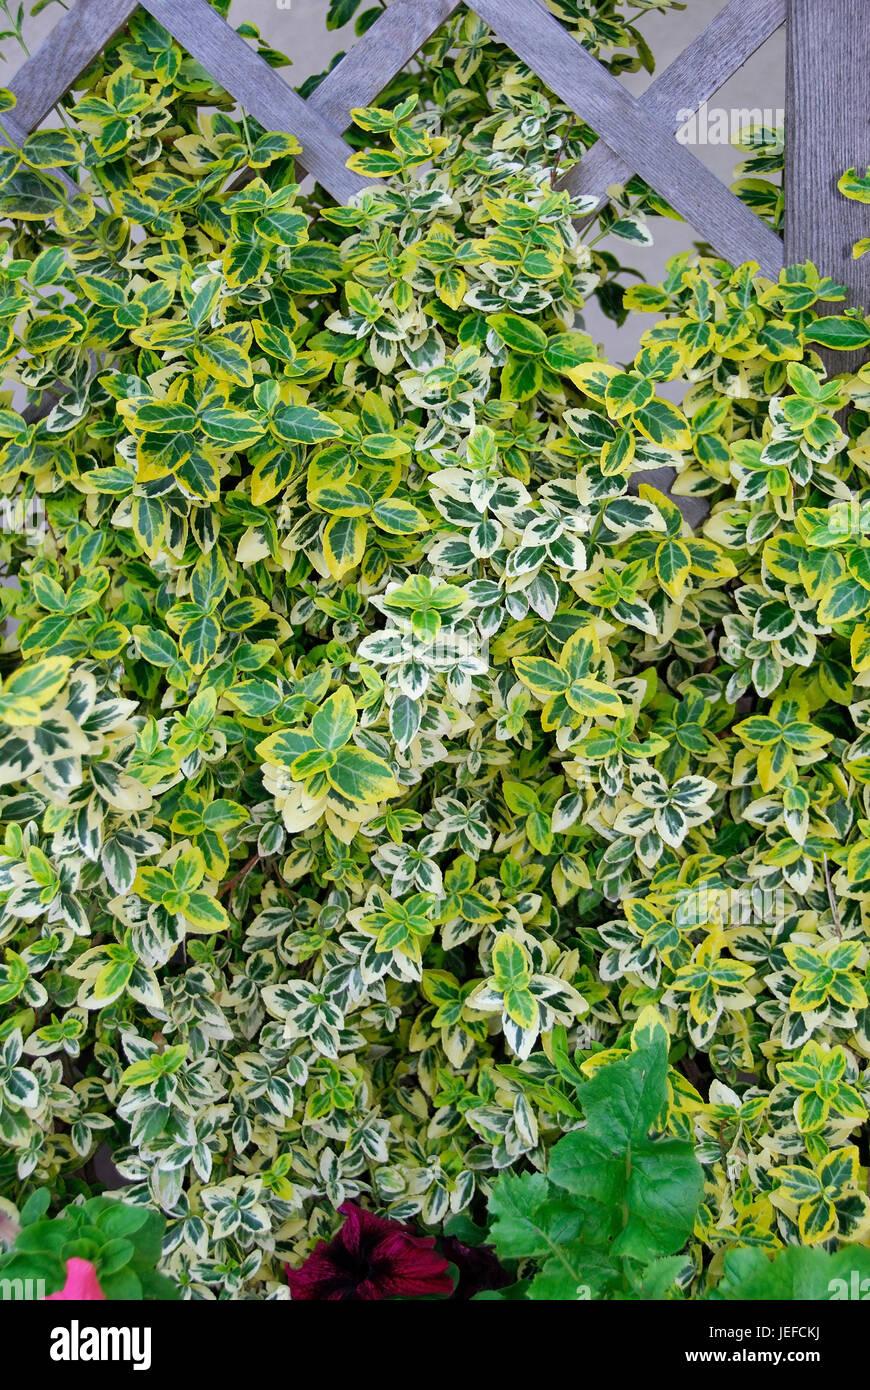 Euonymus fortunei Emeraldn gold, Euonymus fortunei 'Emerald'n Gold' - Stock Image